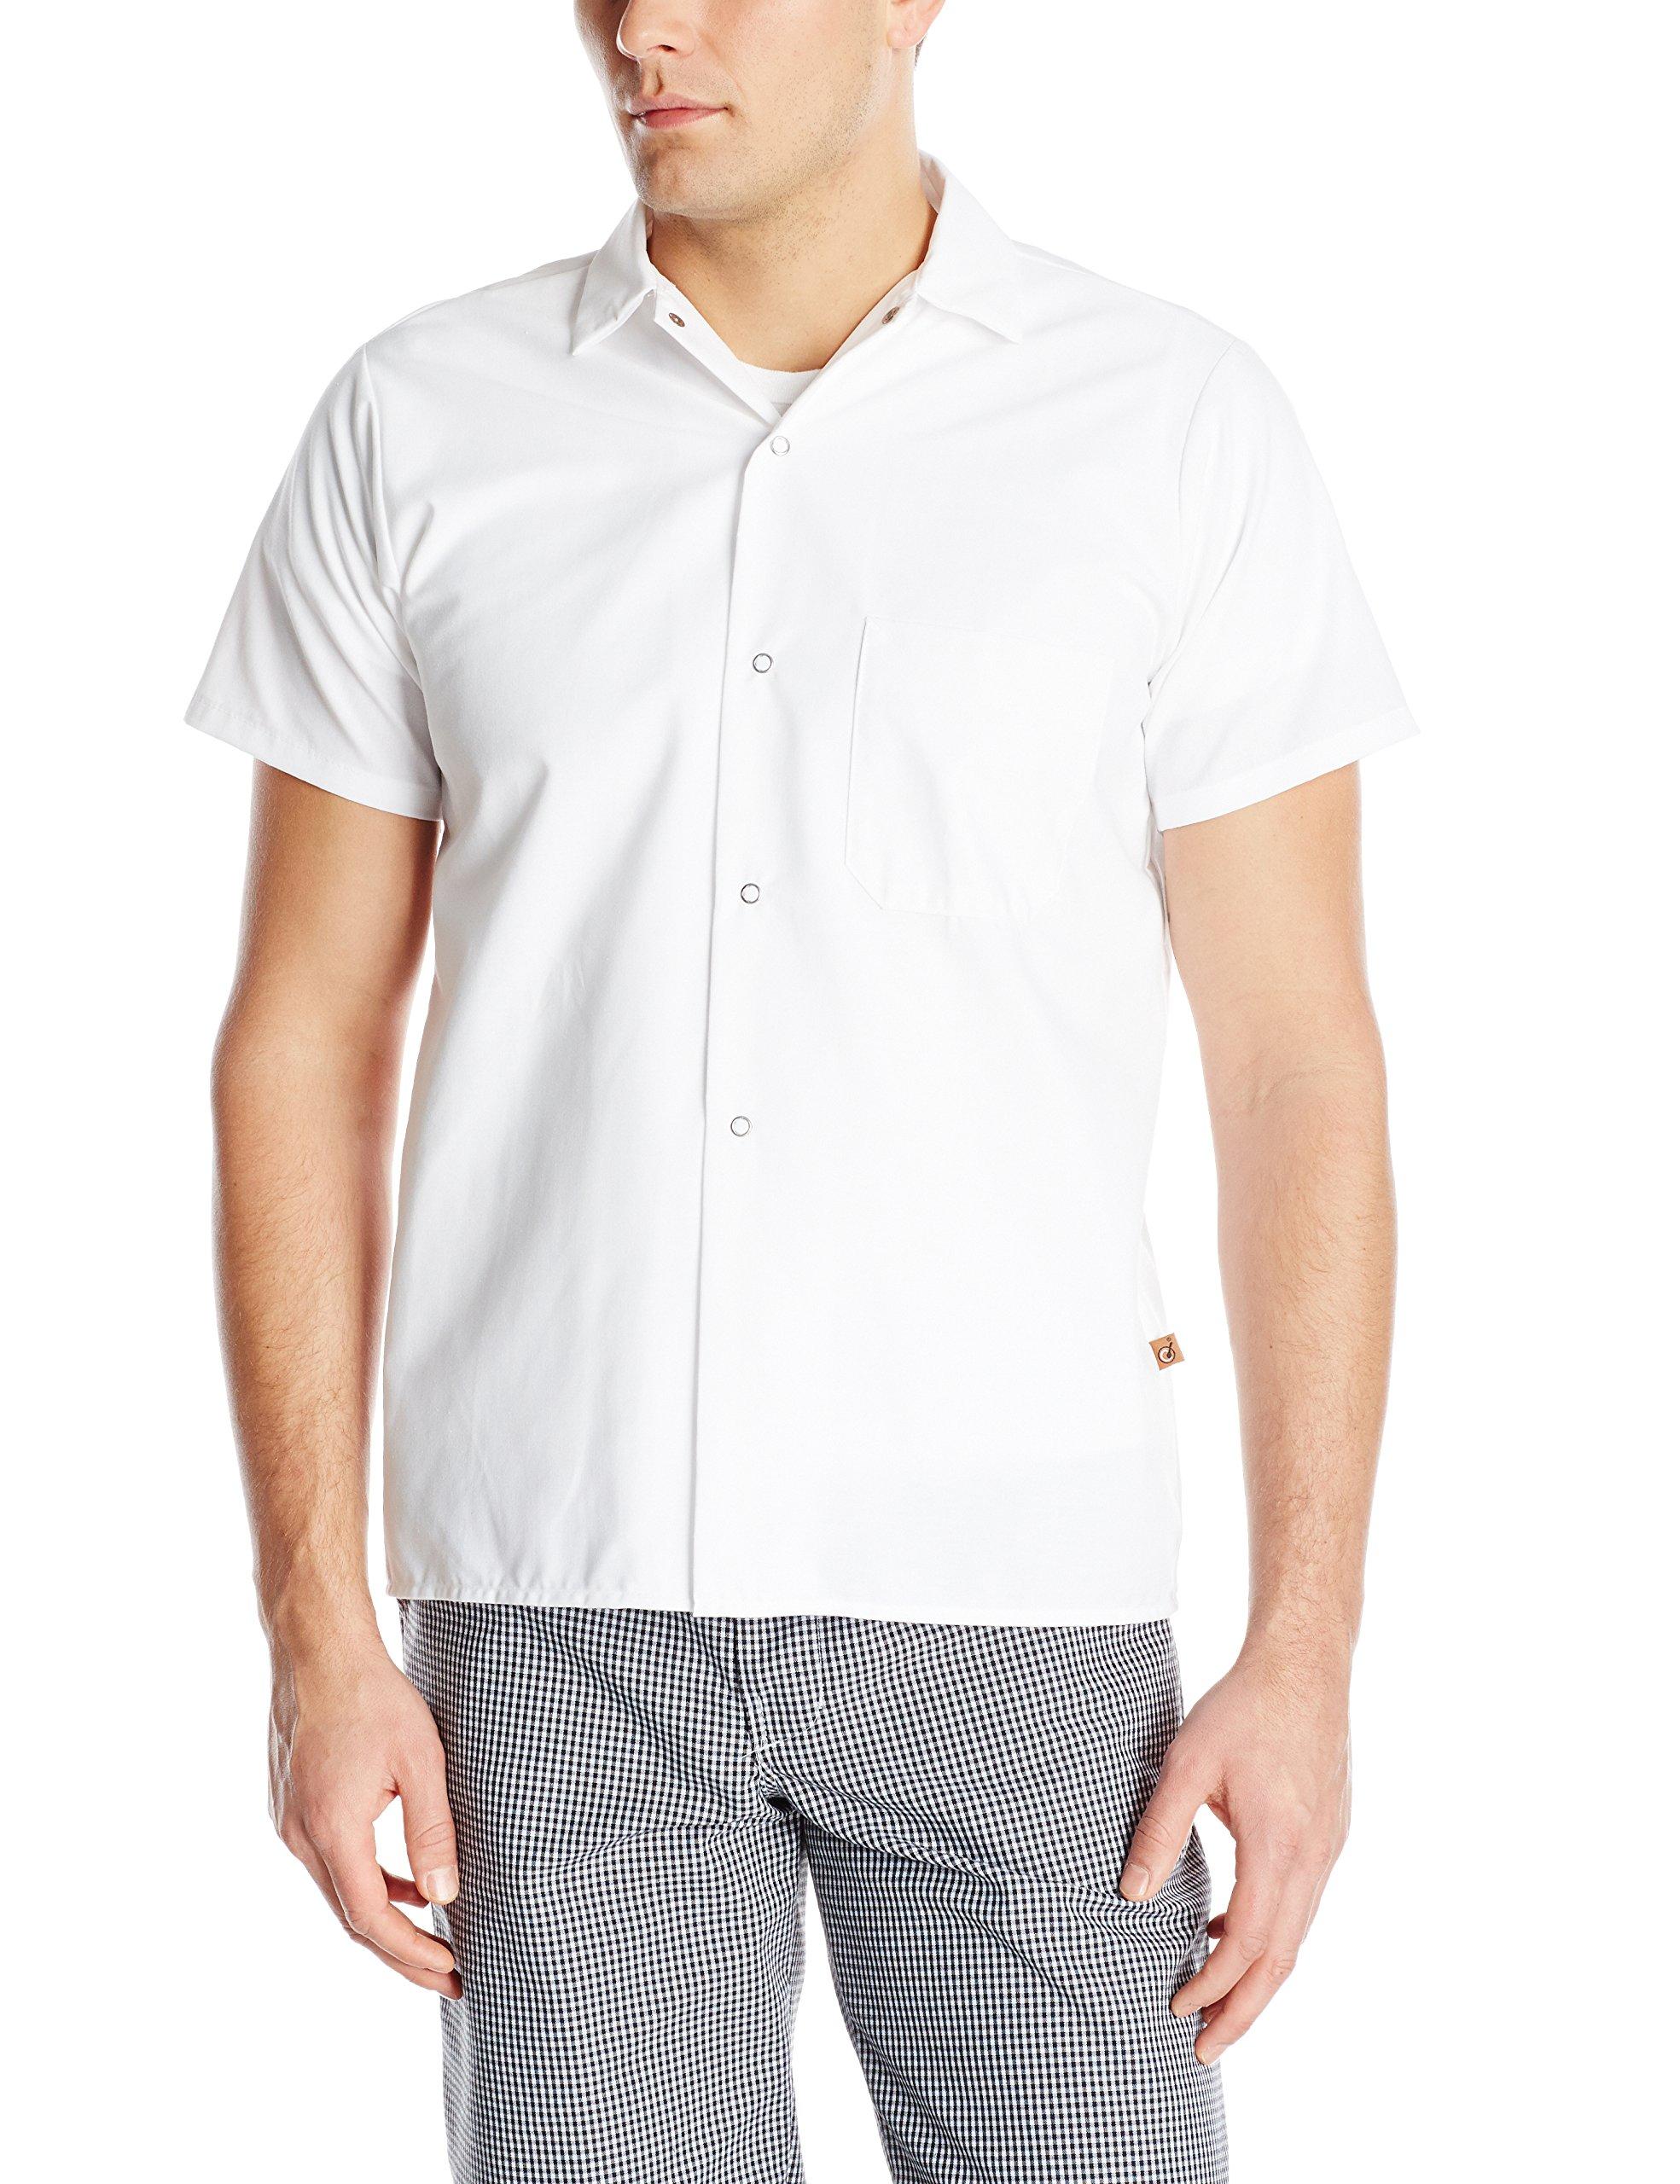 Red Kap Chef DesignsCook Shirt, White, Short Sleeve Small